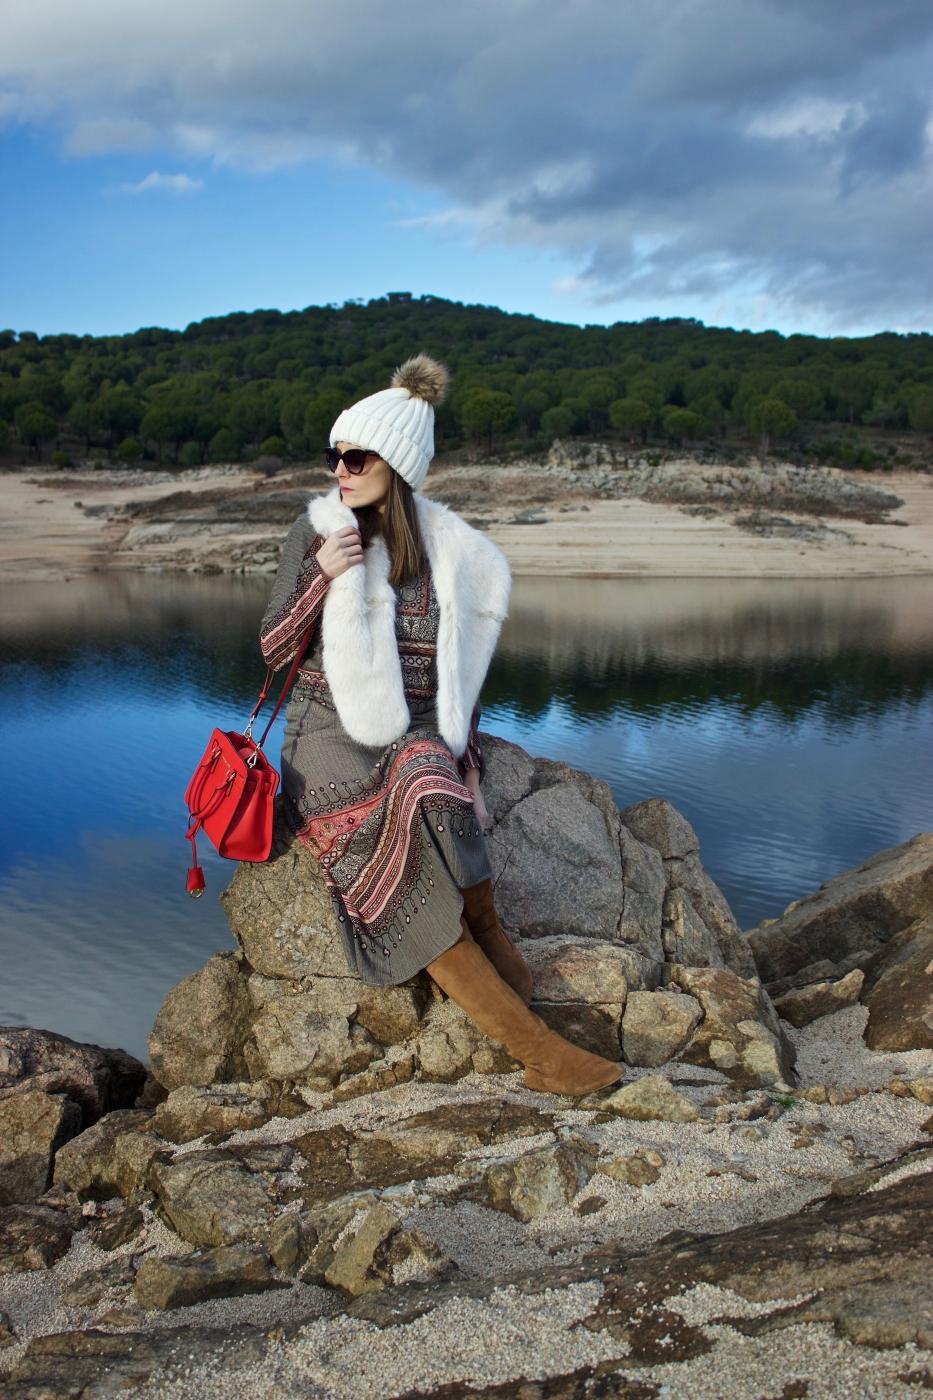 lara-vazquez-madlula-fashion-blog-moda-streetstyle-moda-michael-kors-white-camel-tones